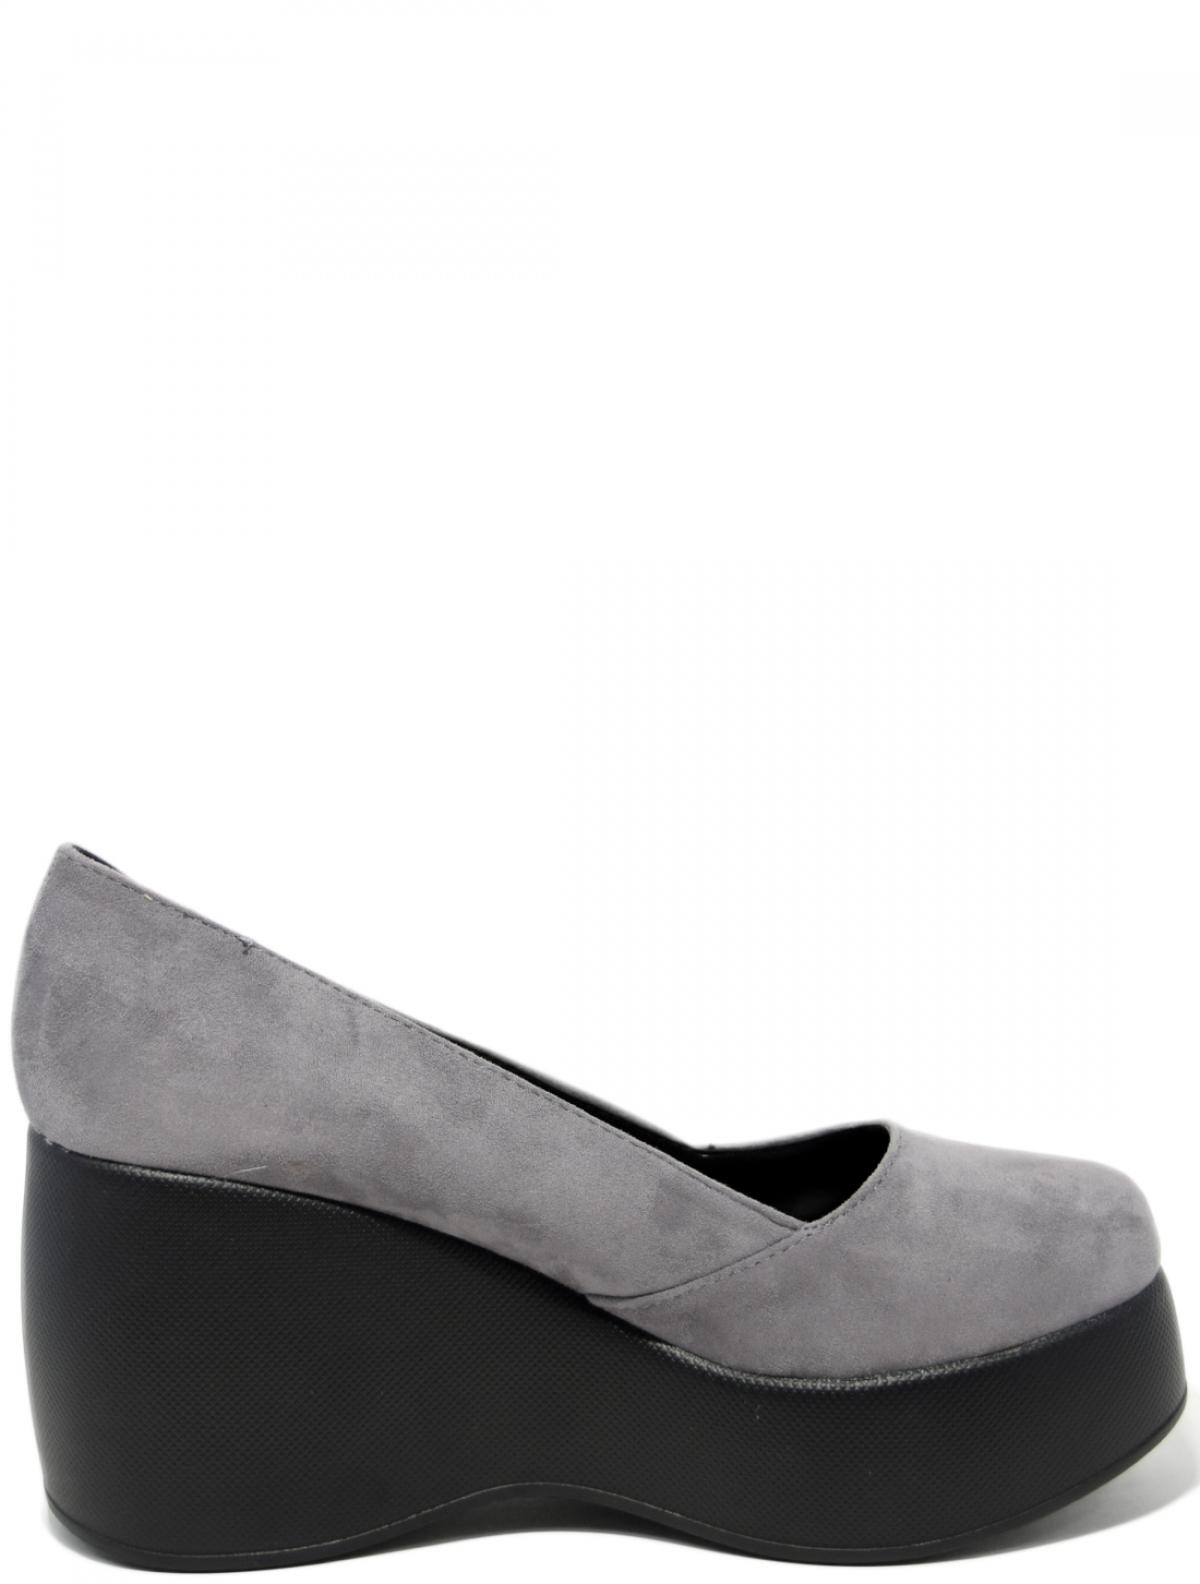 Admlis M573-5 женские туфли